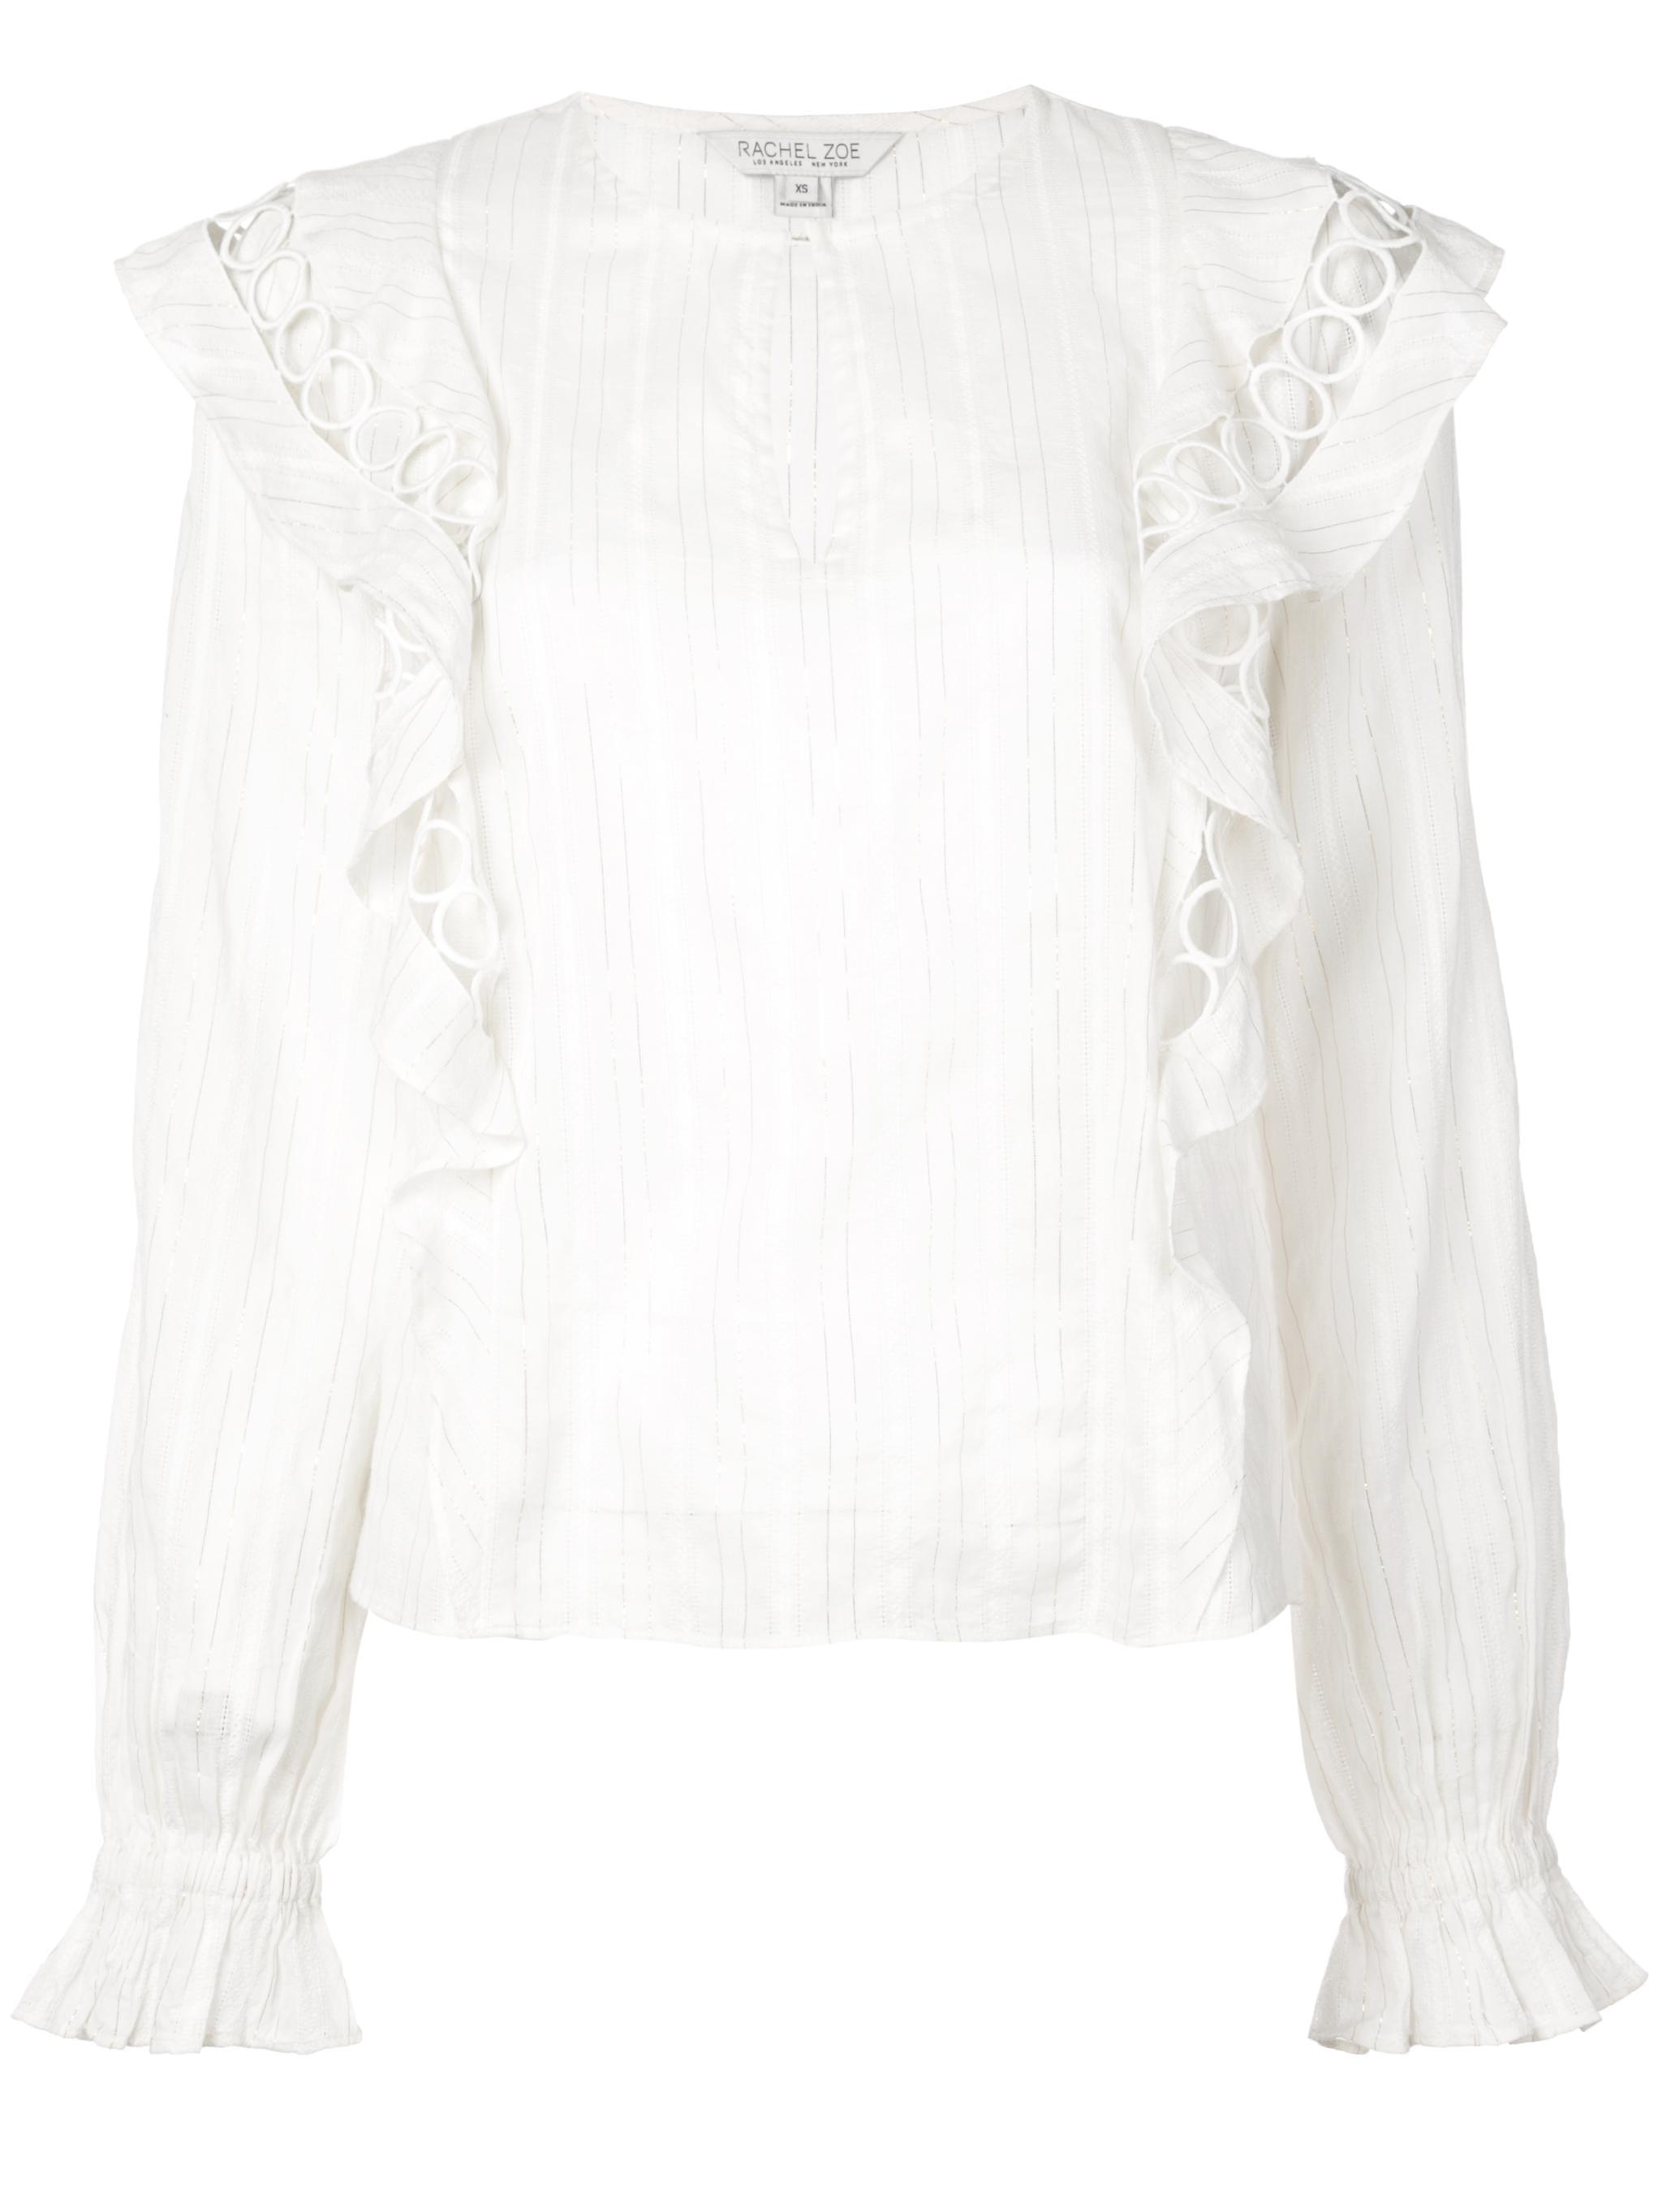 Felicia Long Sleeve Top Item # SU19T363